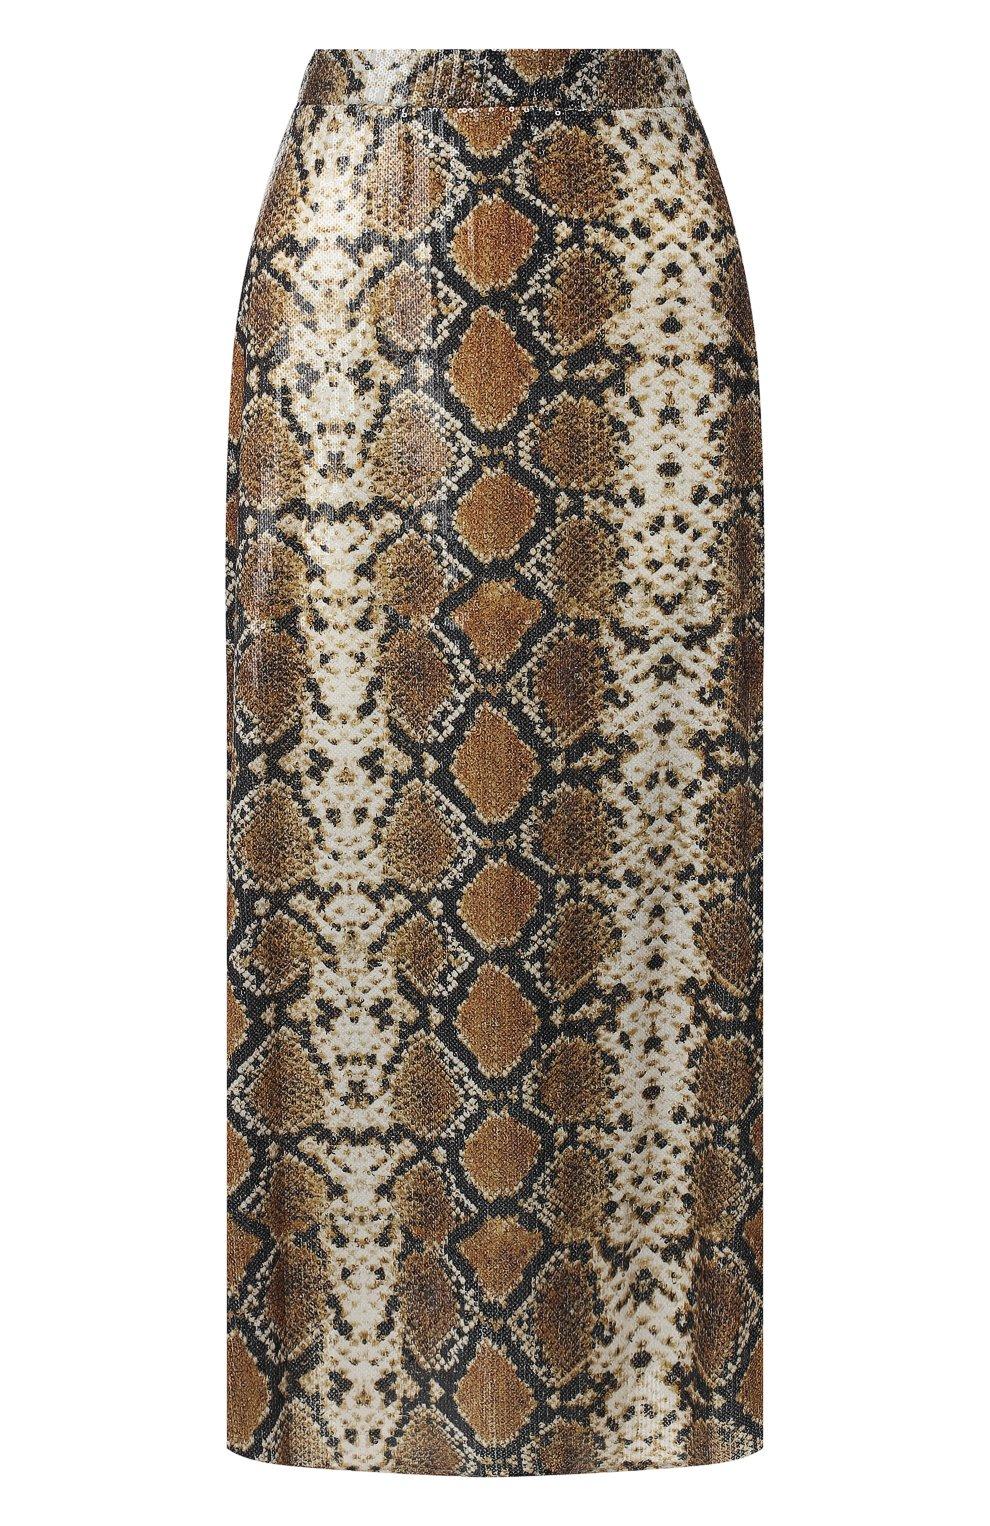 Женская юбка с принтом IN THE MOOD FOR LOVE серого цвета, арт. THE KATE SKIRT | Фото 1